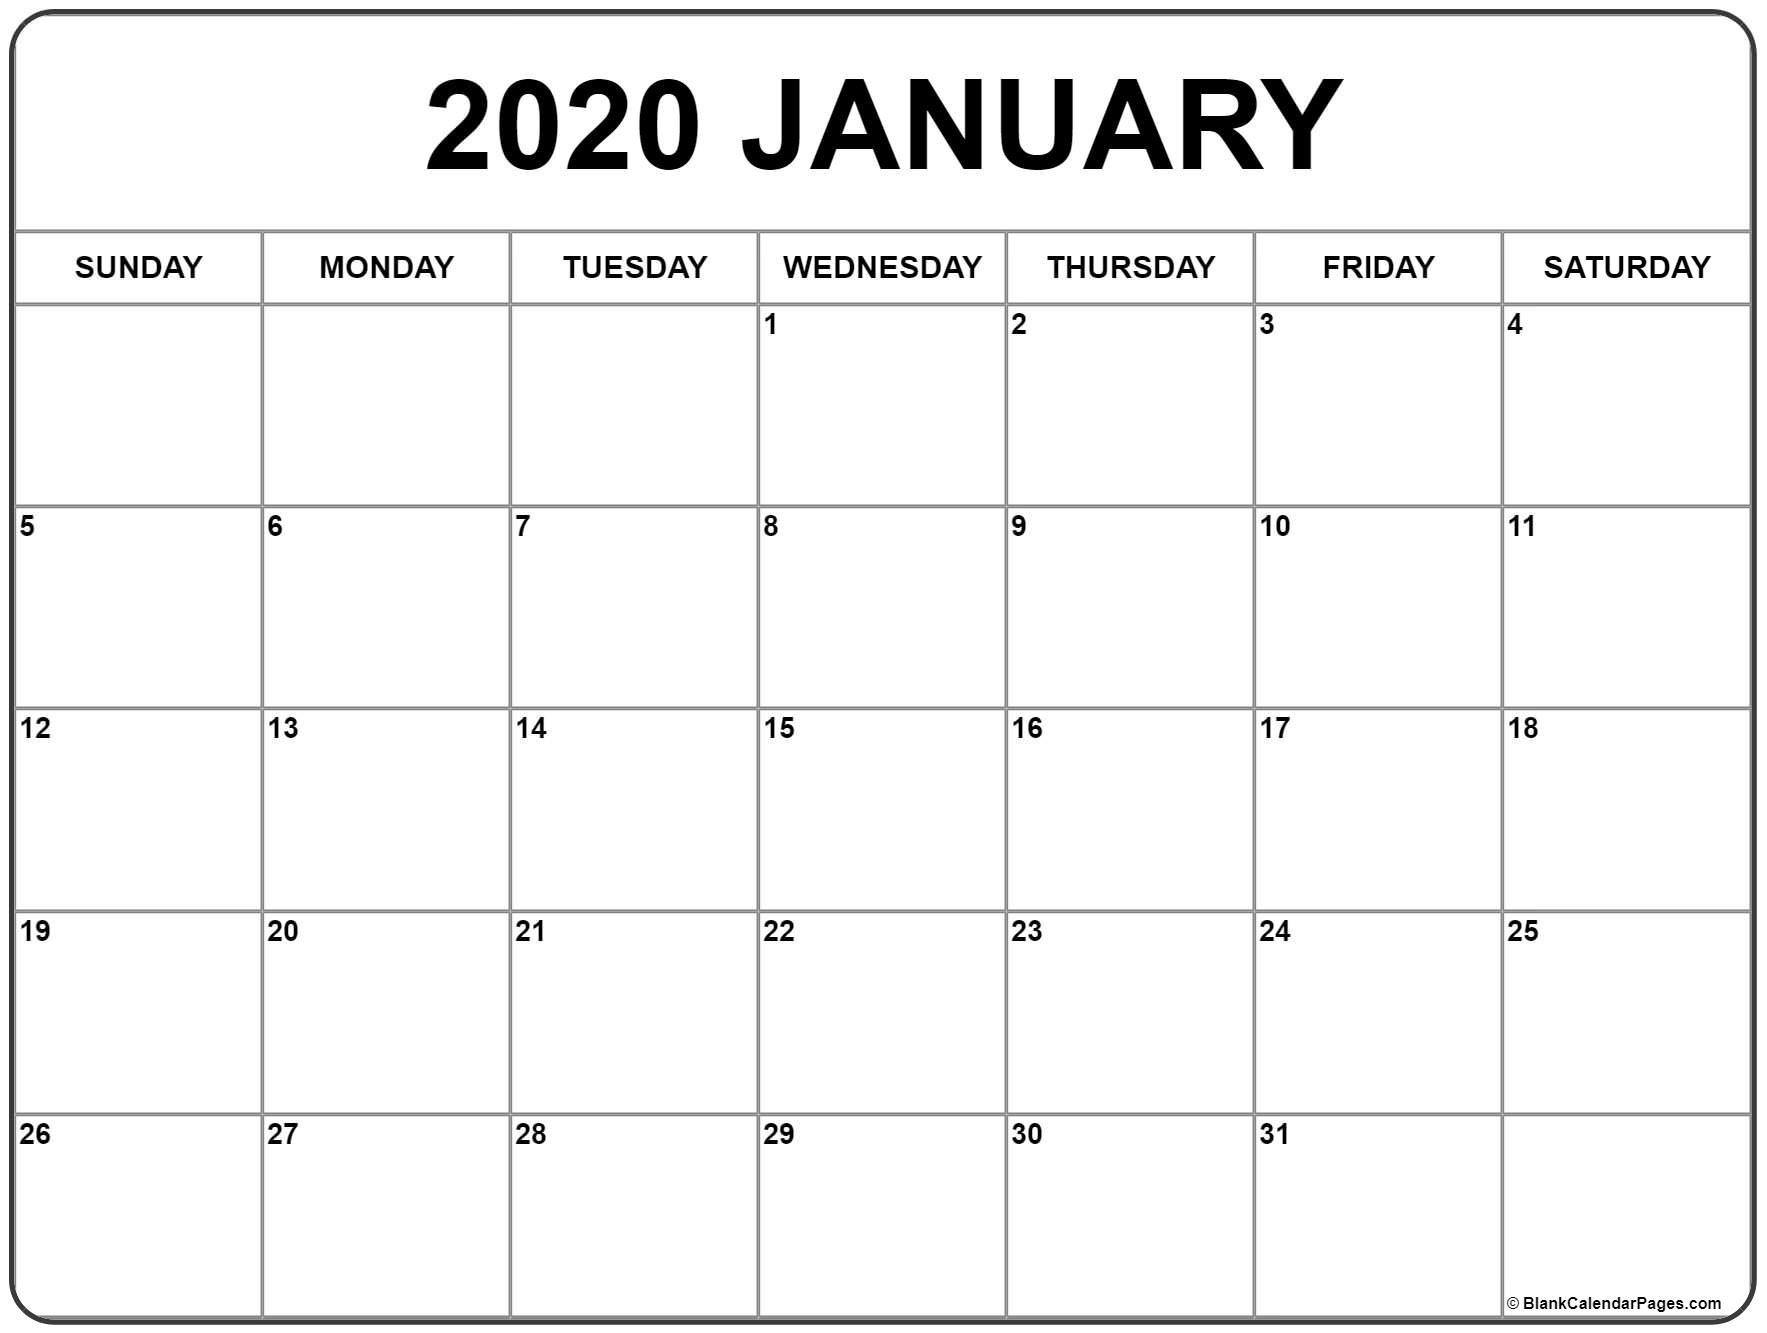 January 2020 Calendar | Free Printable Monthly Calendars-Blank Calendar Template January 2020